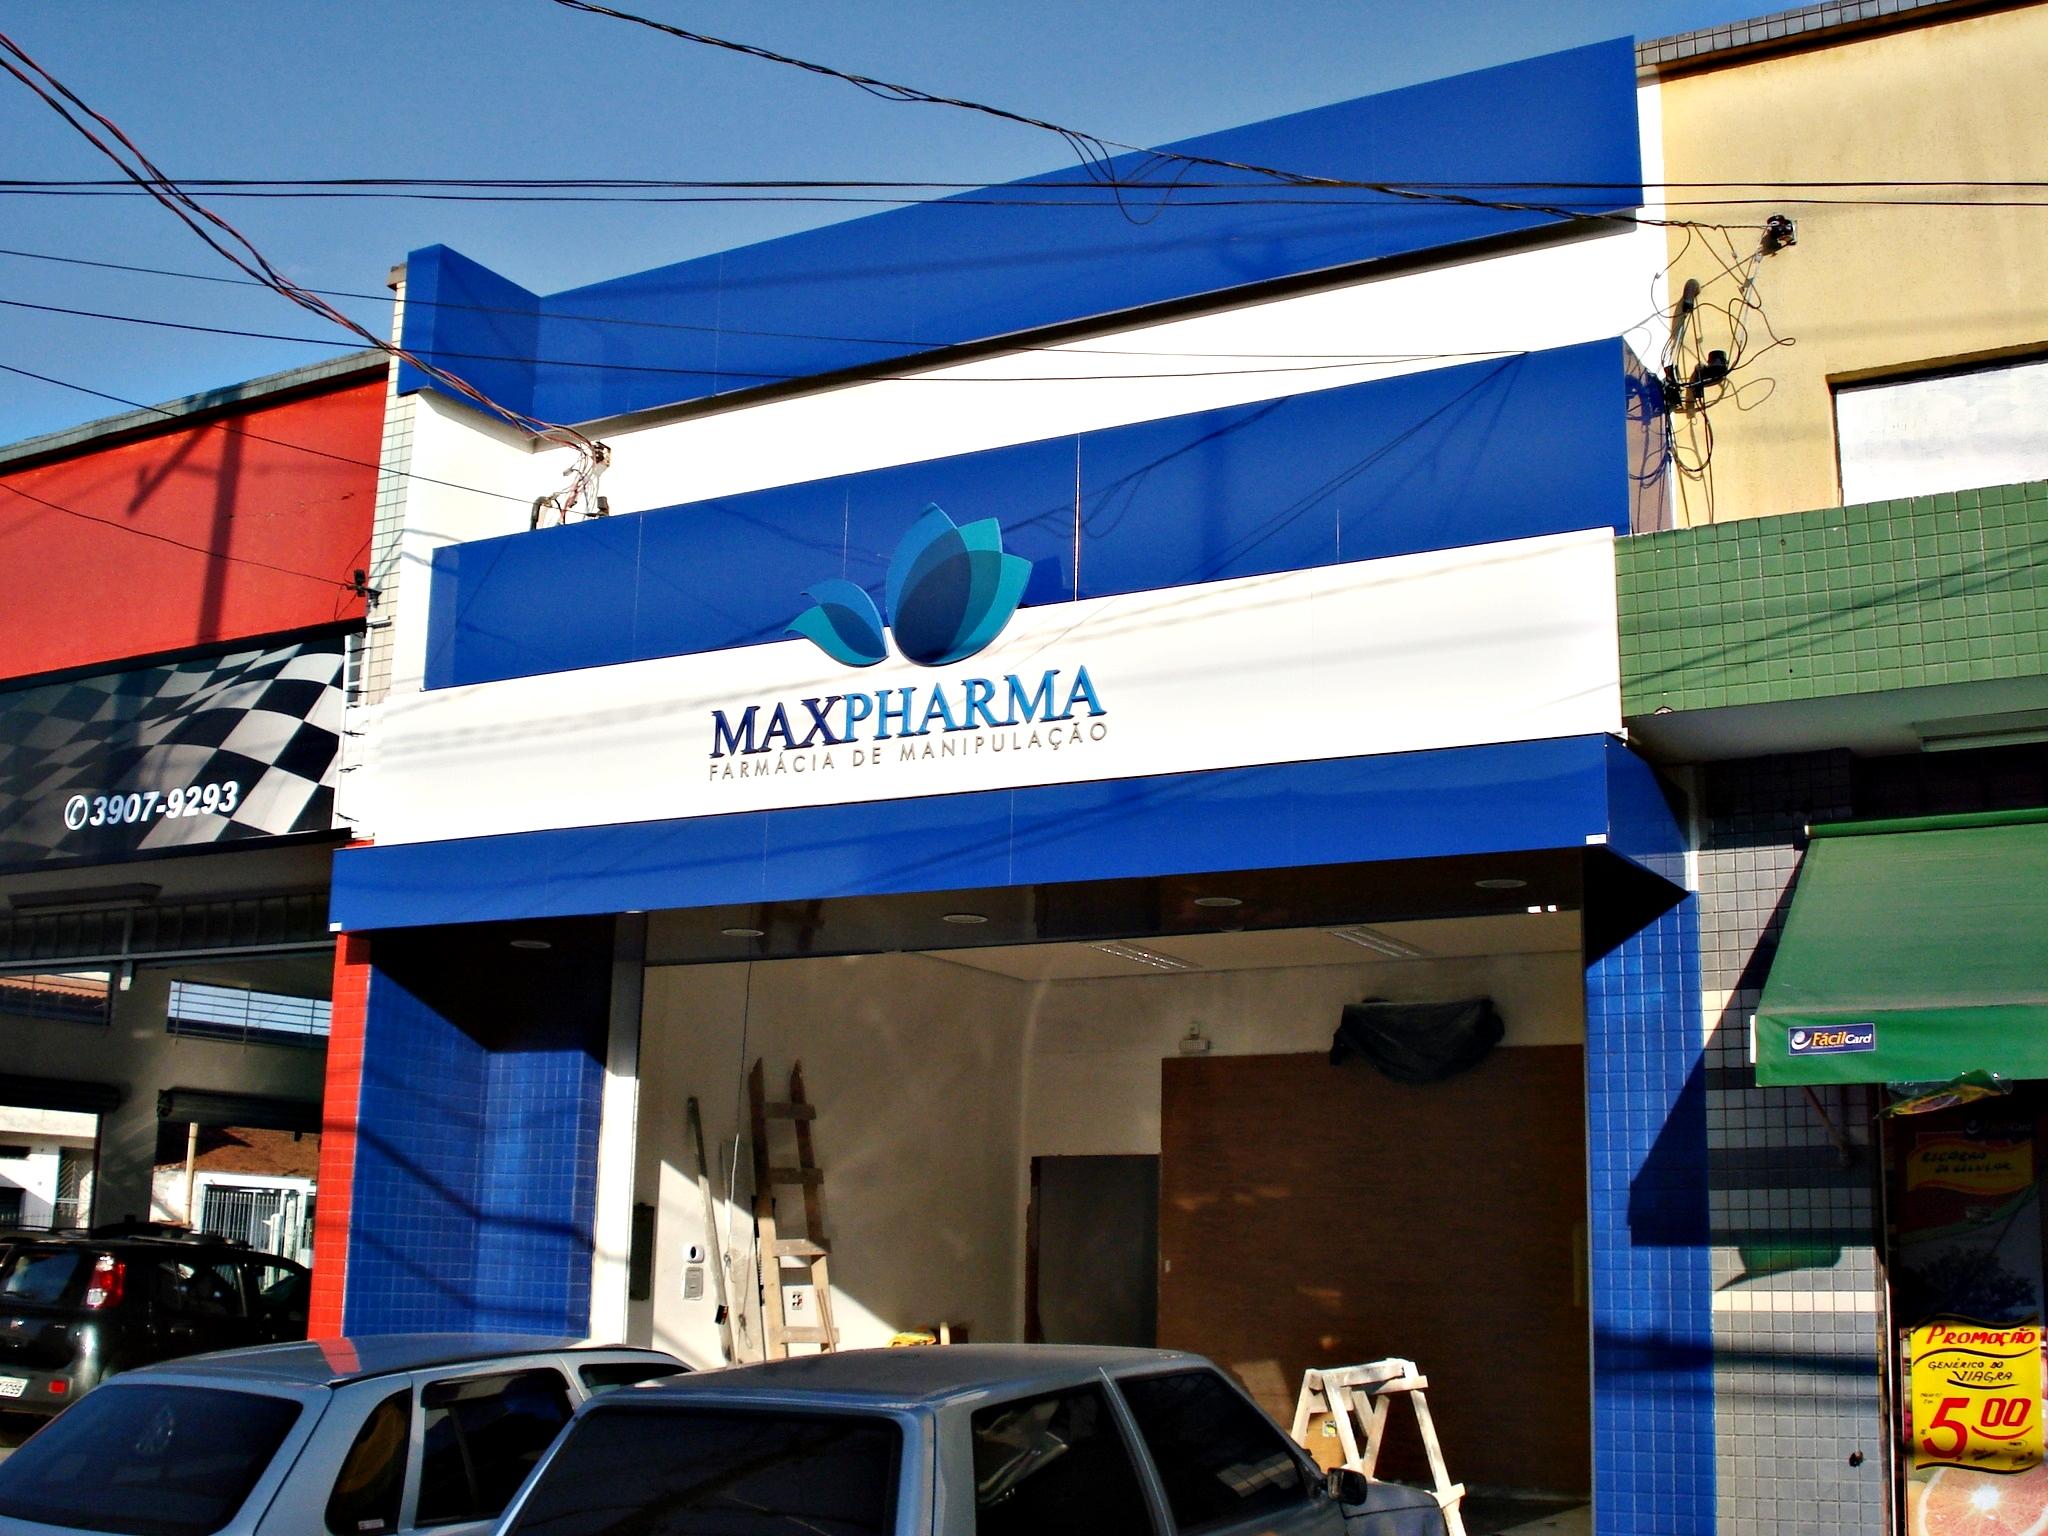 MAXPHARMA